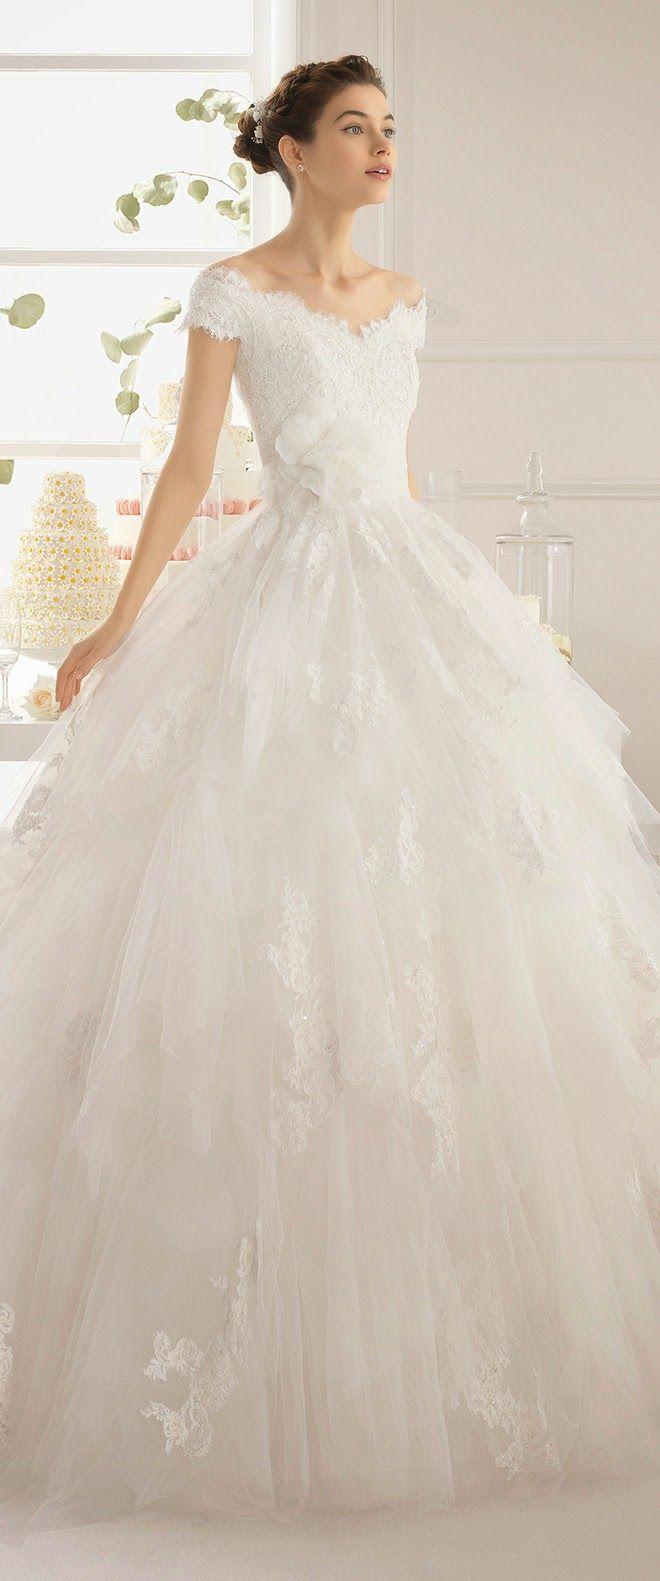 8463 best wedding dresses images on pinterest wedding for Wedding dress shops in dc